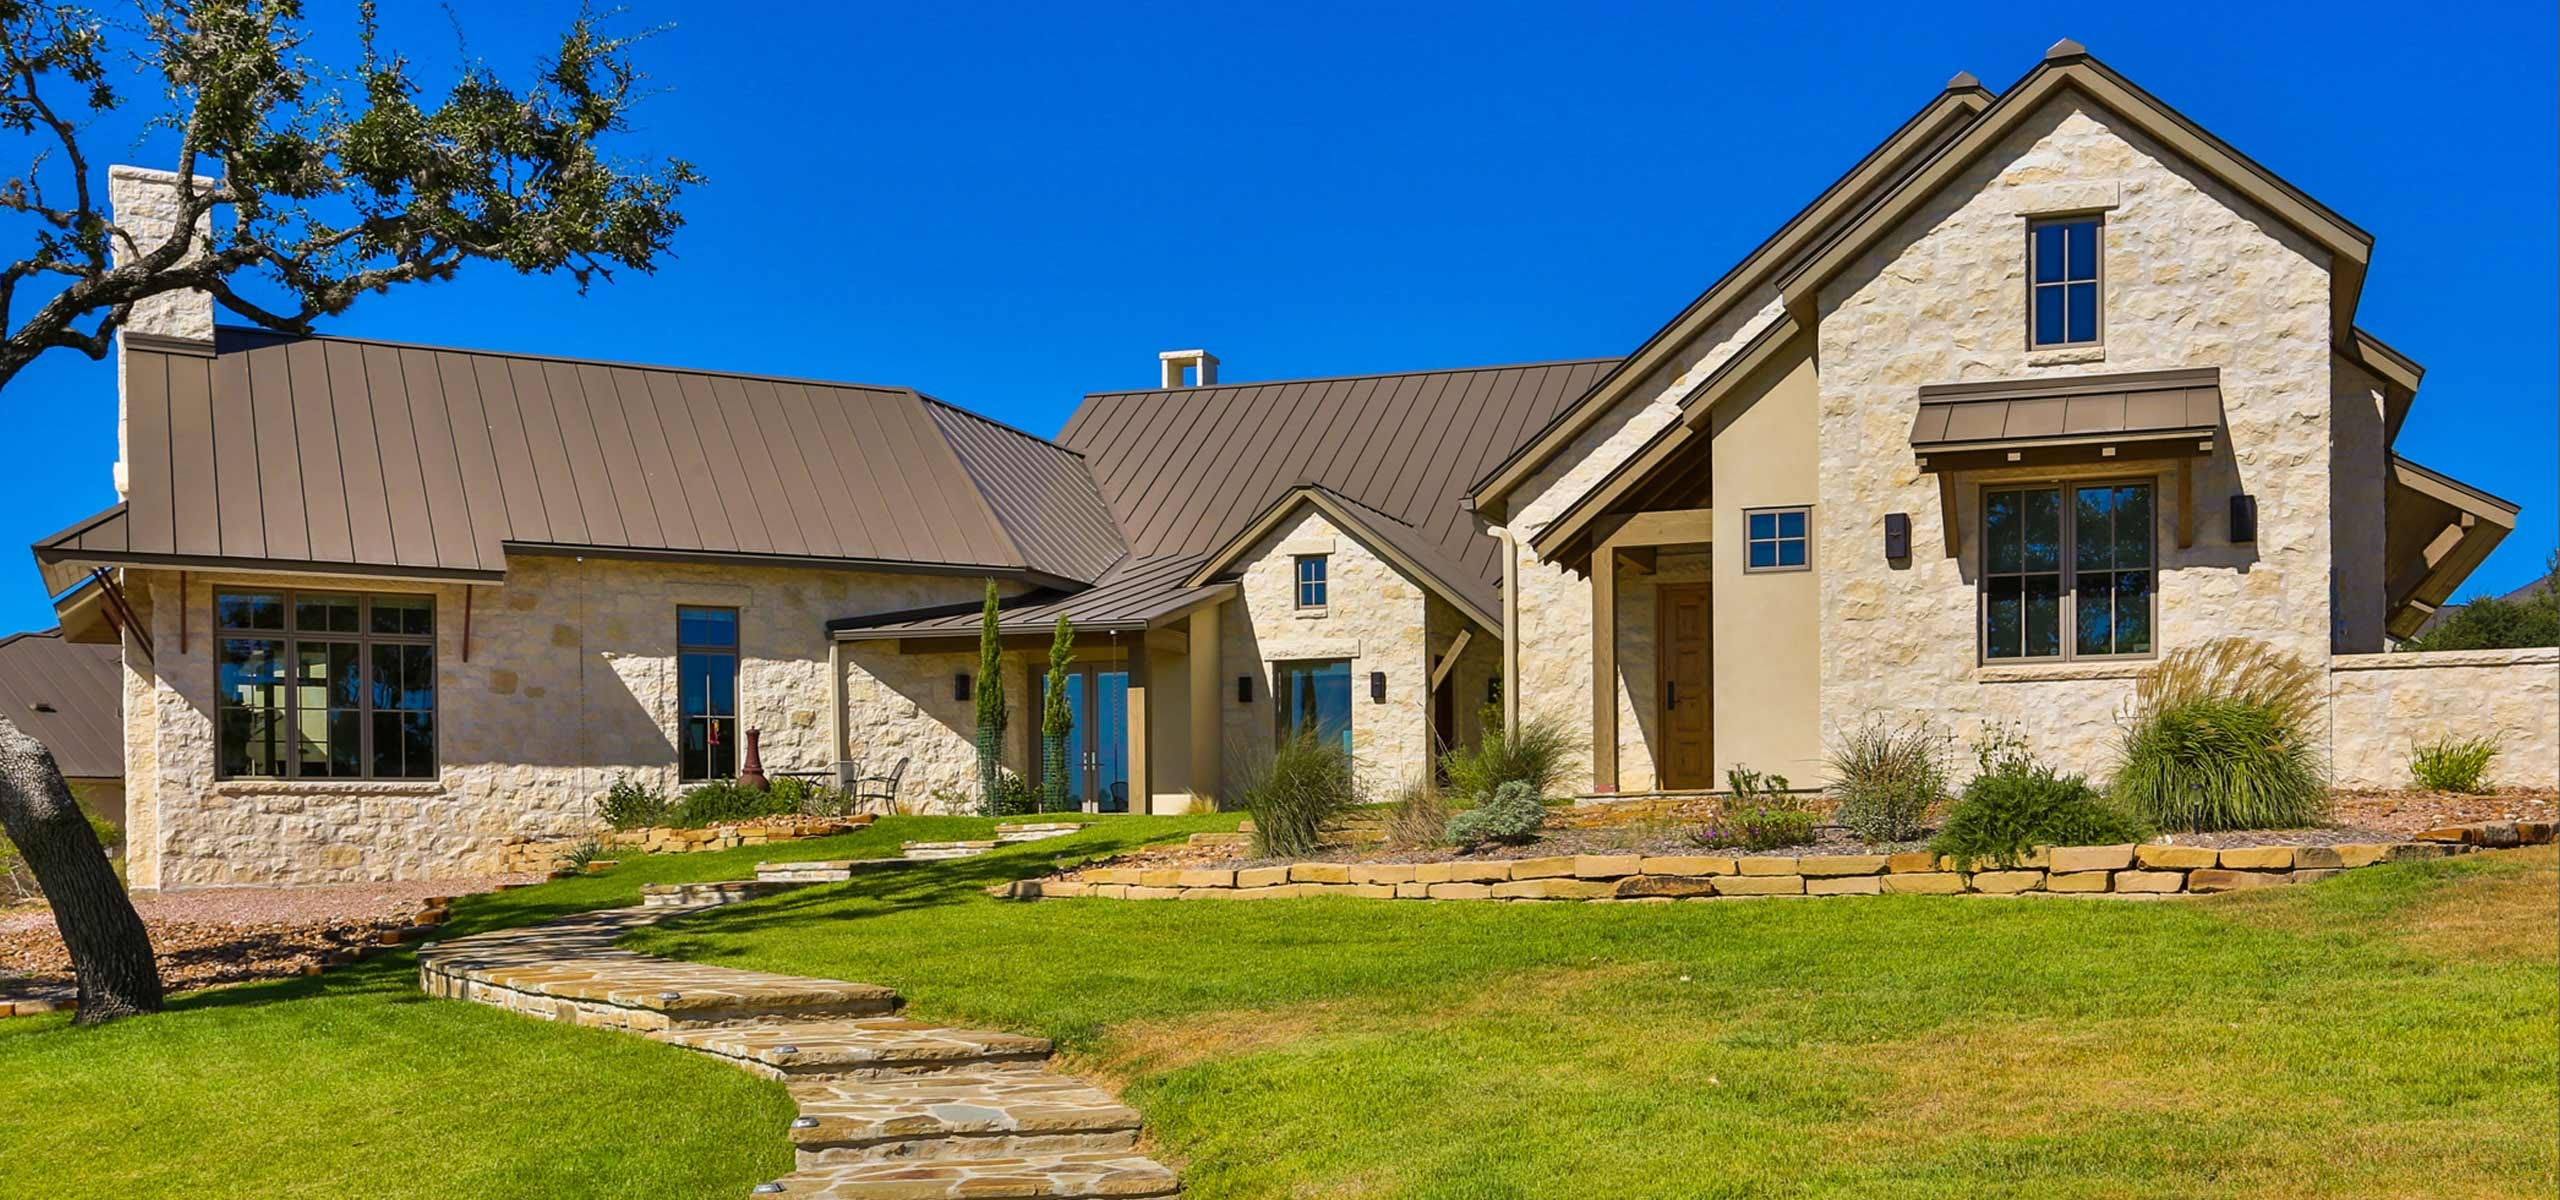 Home texas home plans for Texas home plans